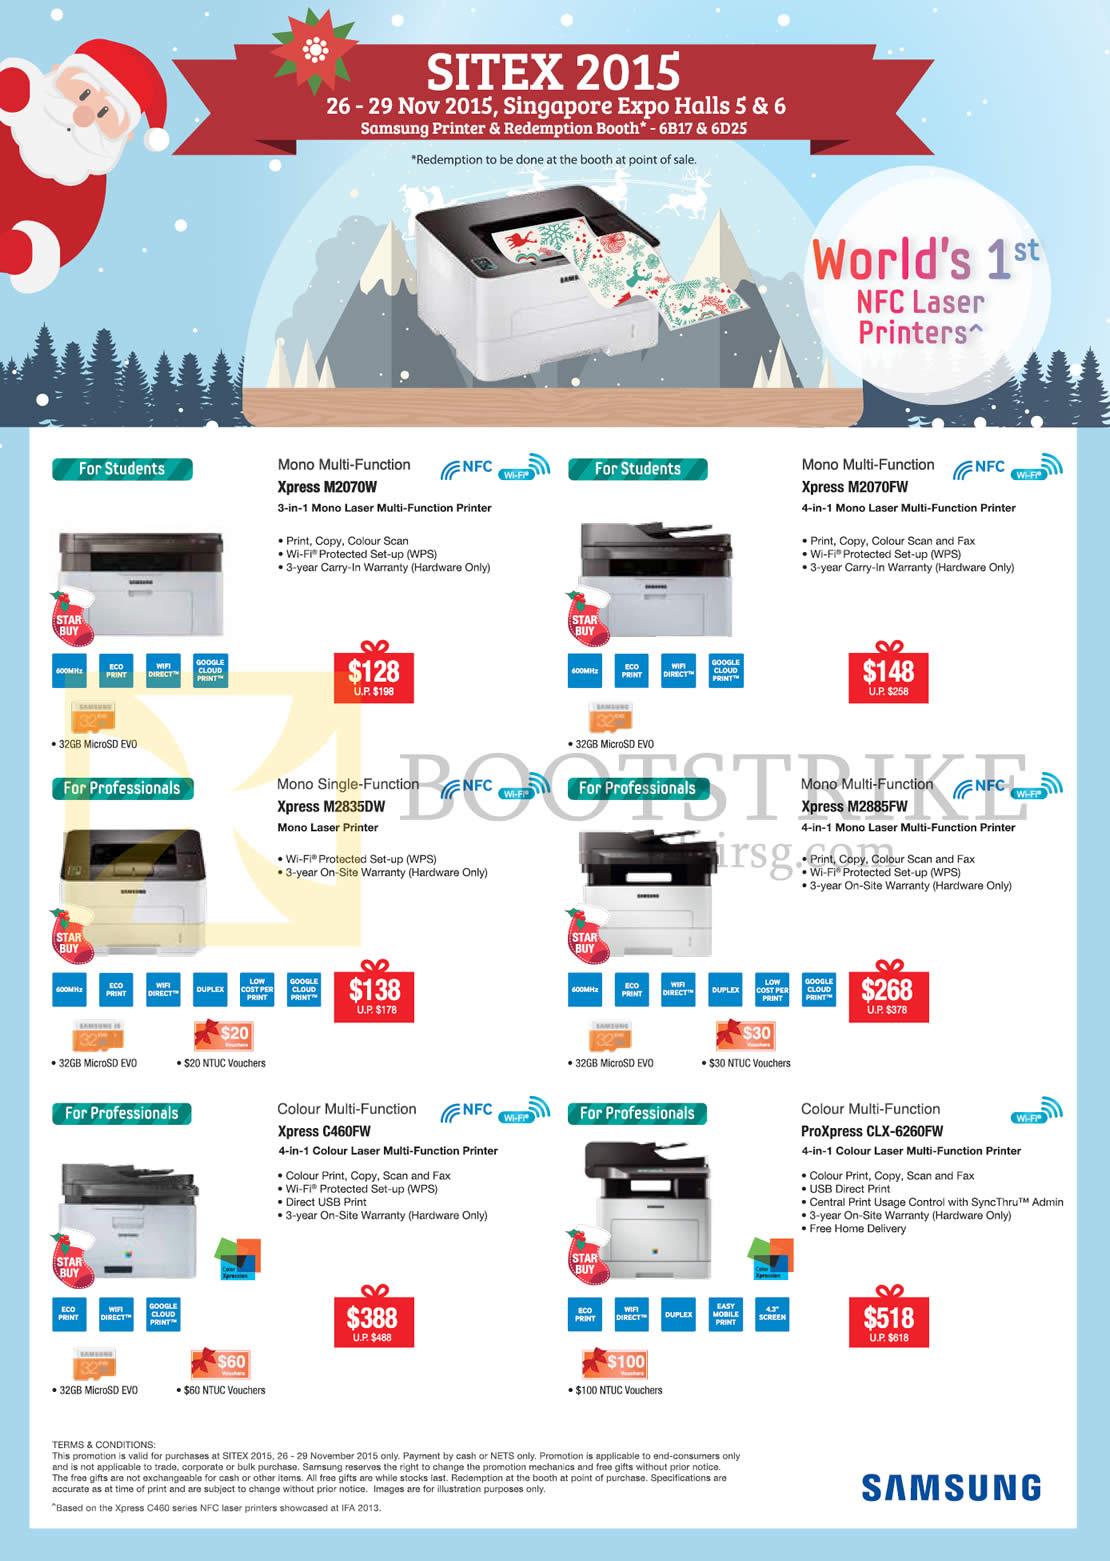 SITEX 2015 price list image brochure of Samsung Printers Laser Xpress M2070W, M2070FW, M2835DW, M2885FW, C460FW, CLX-6260FW